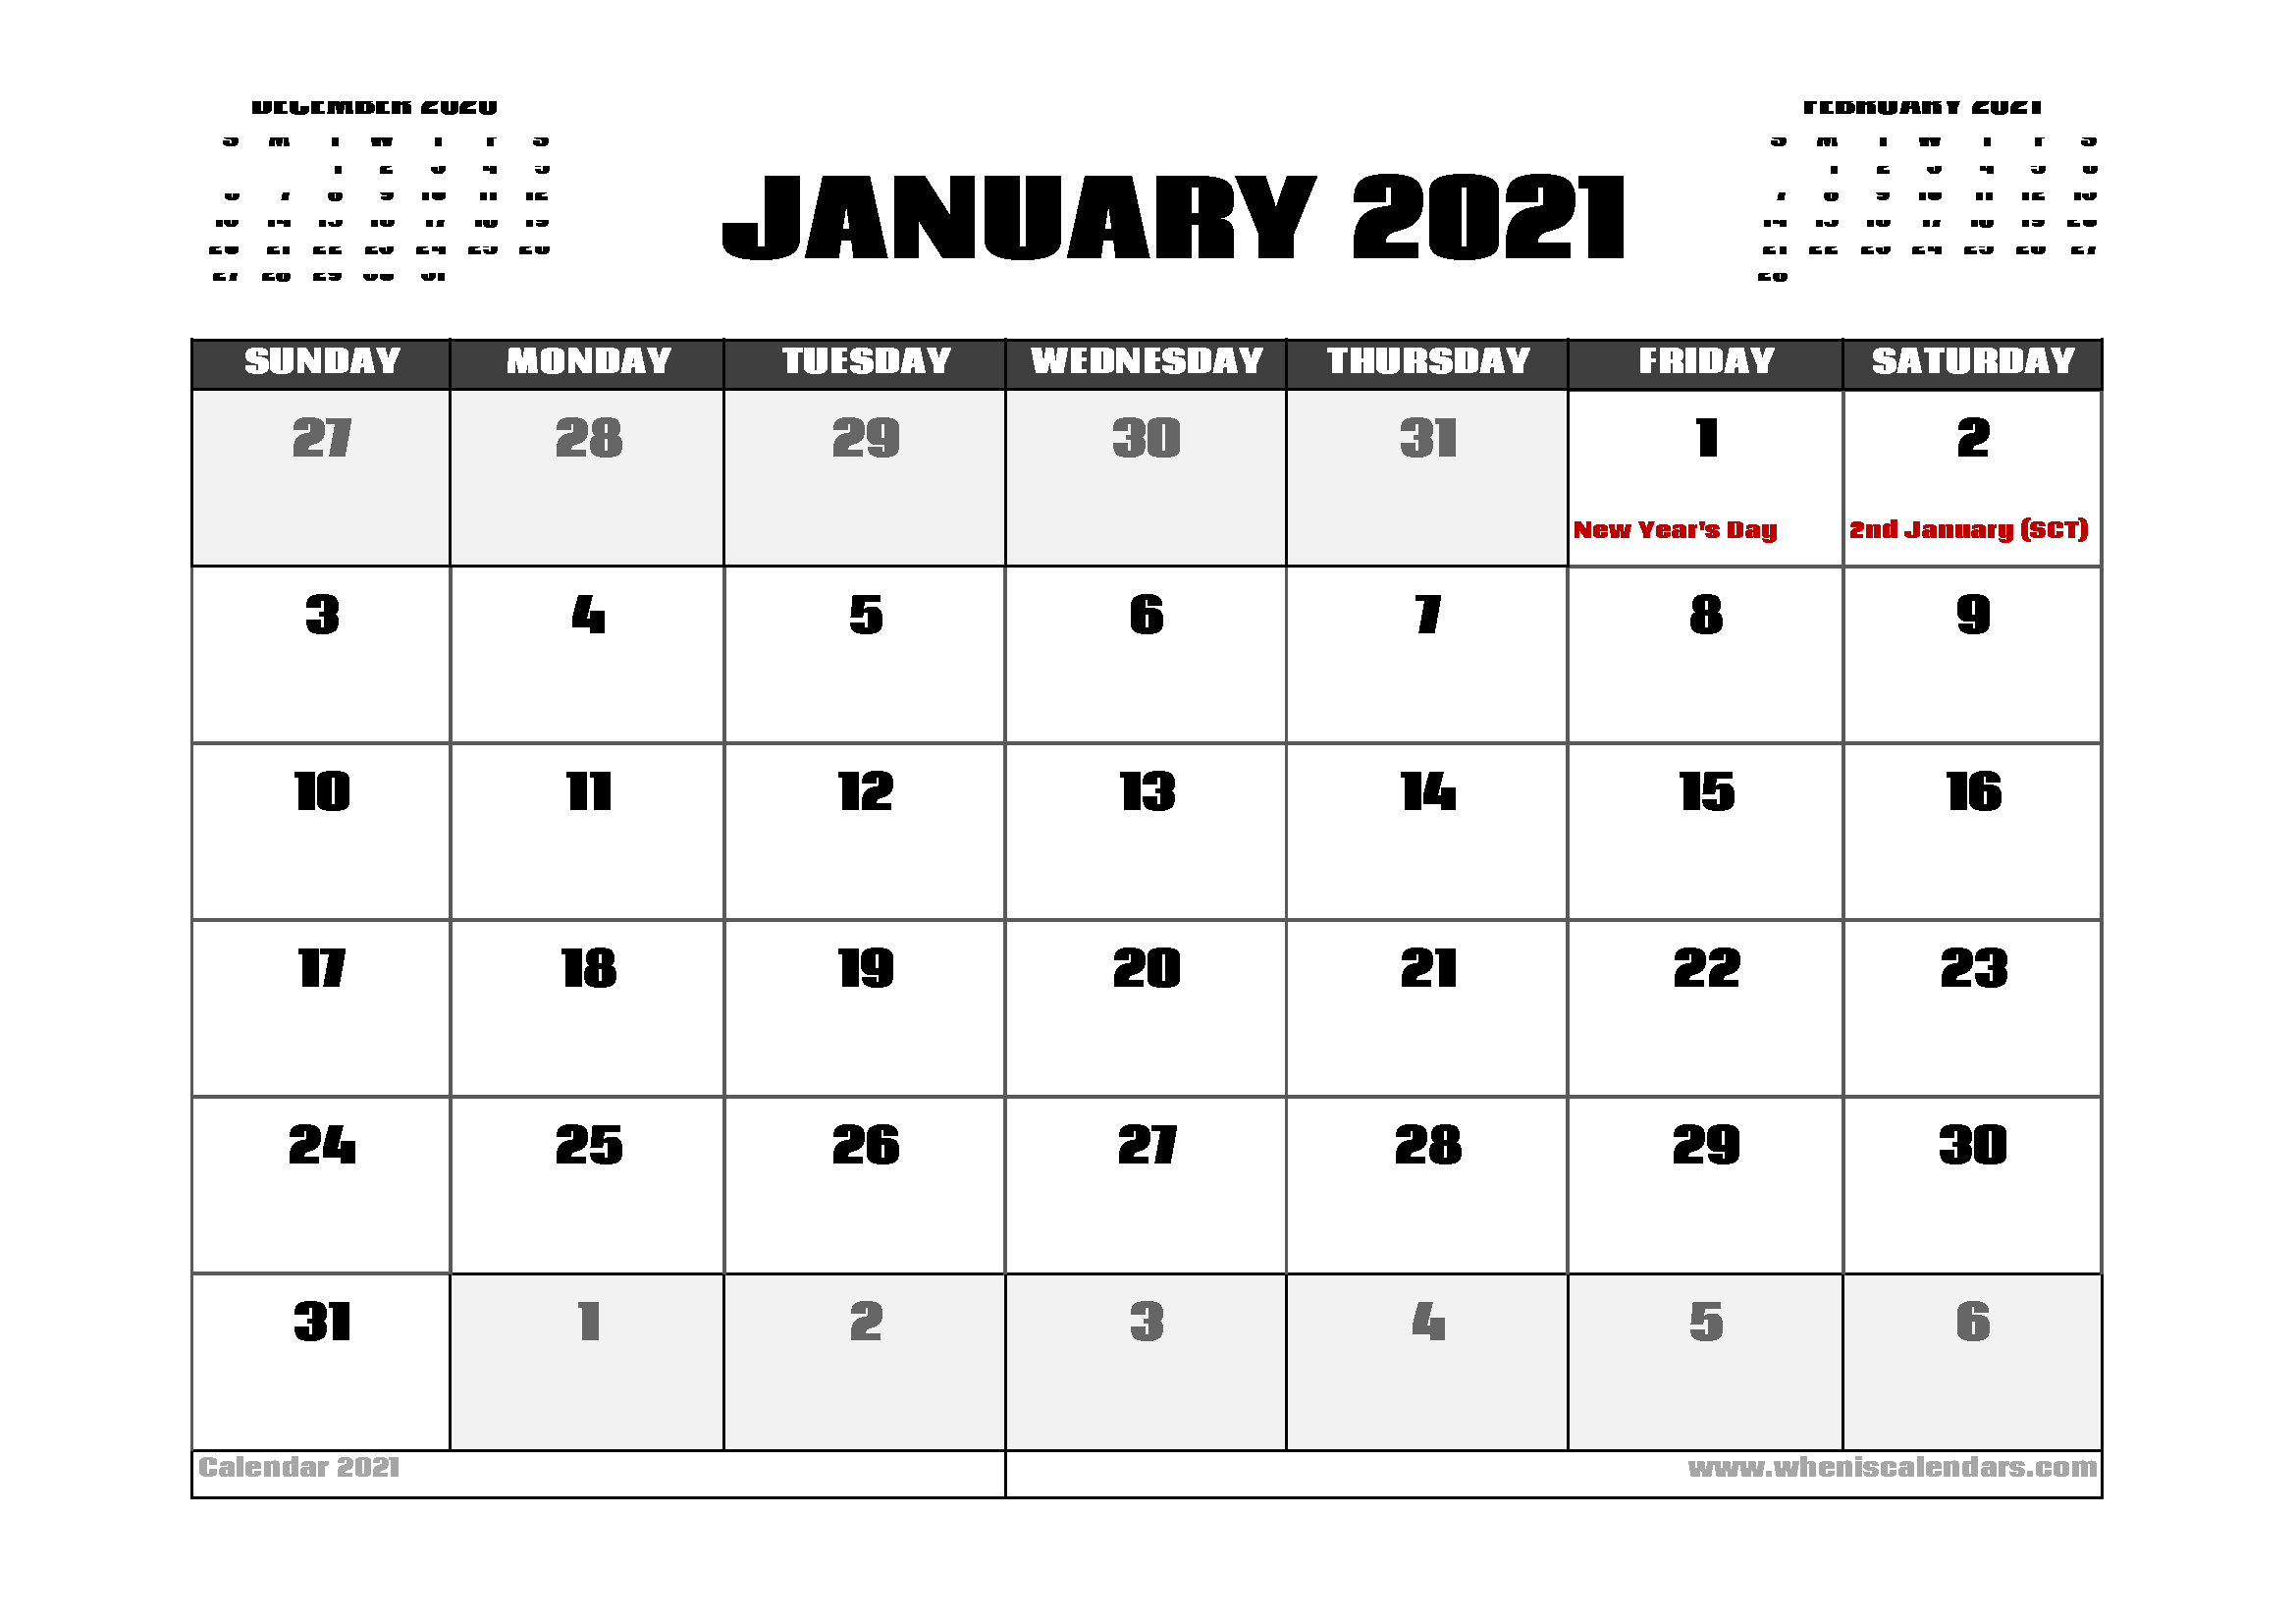 January 2021 Calendar UK with Holidays